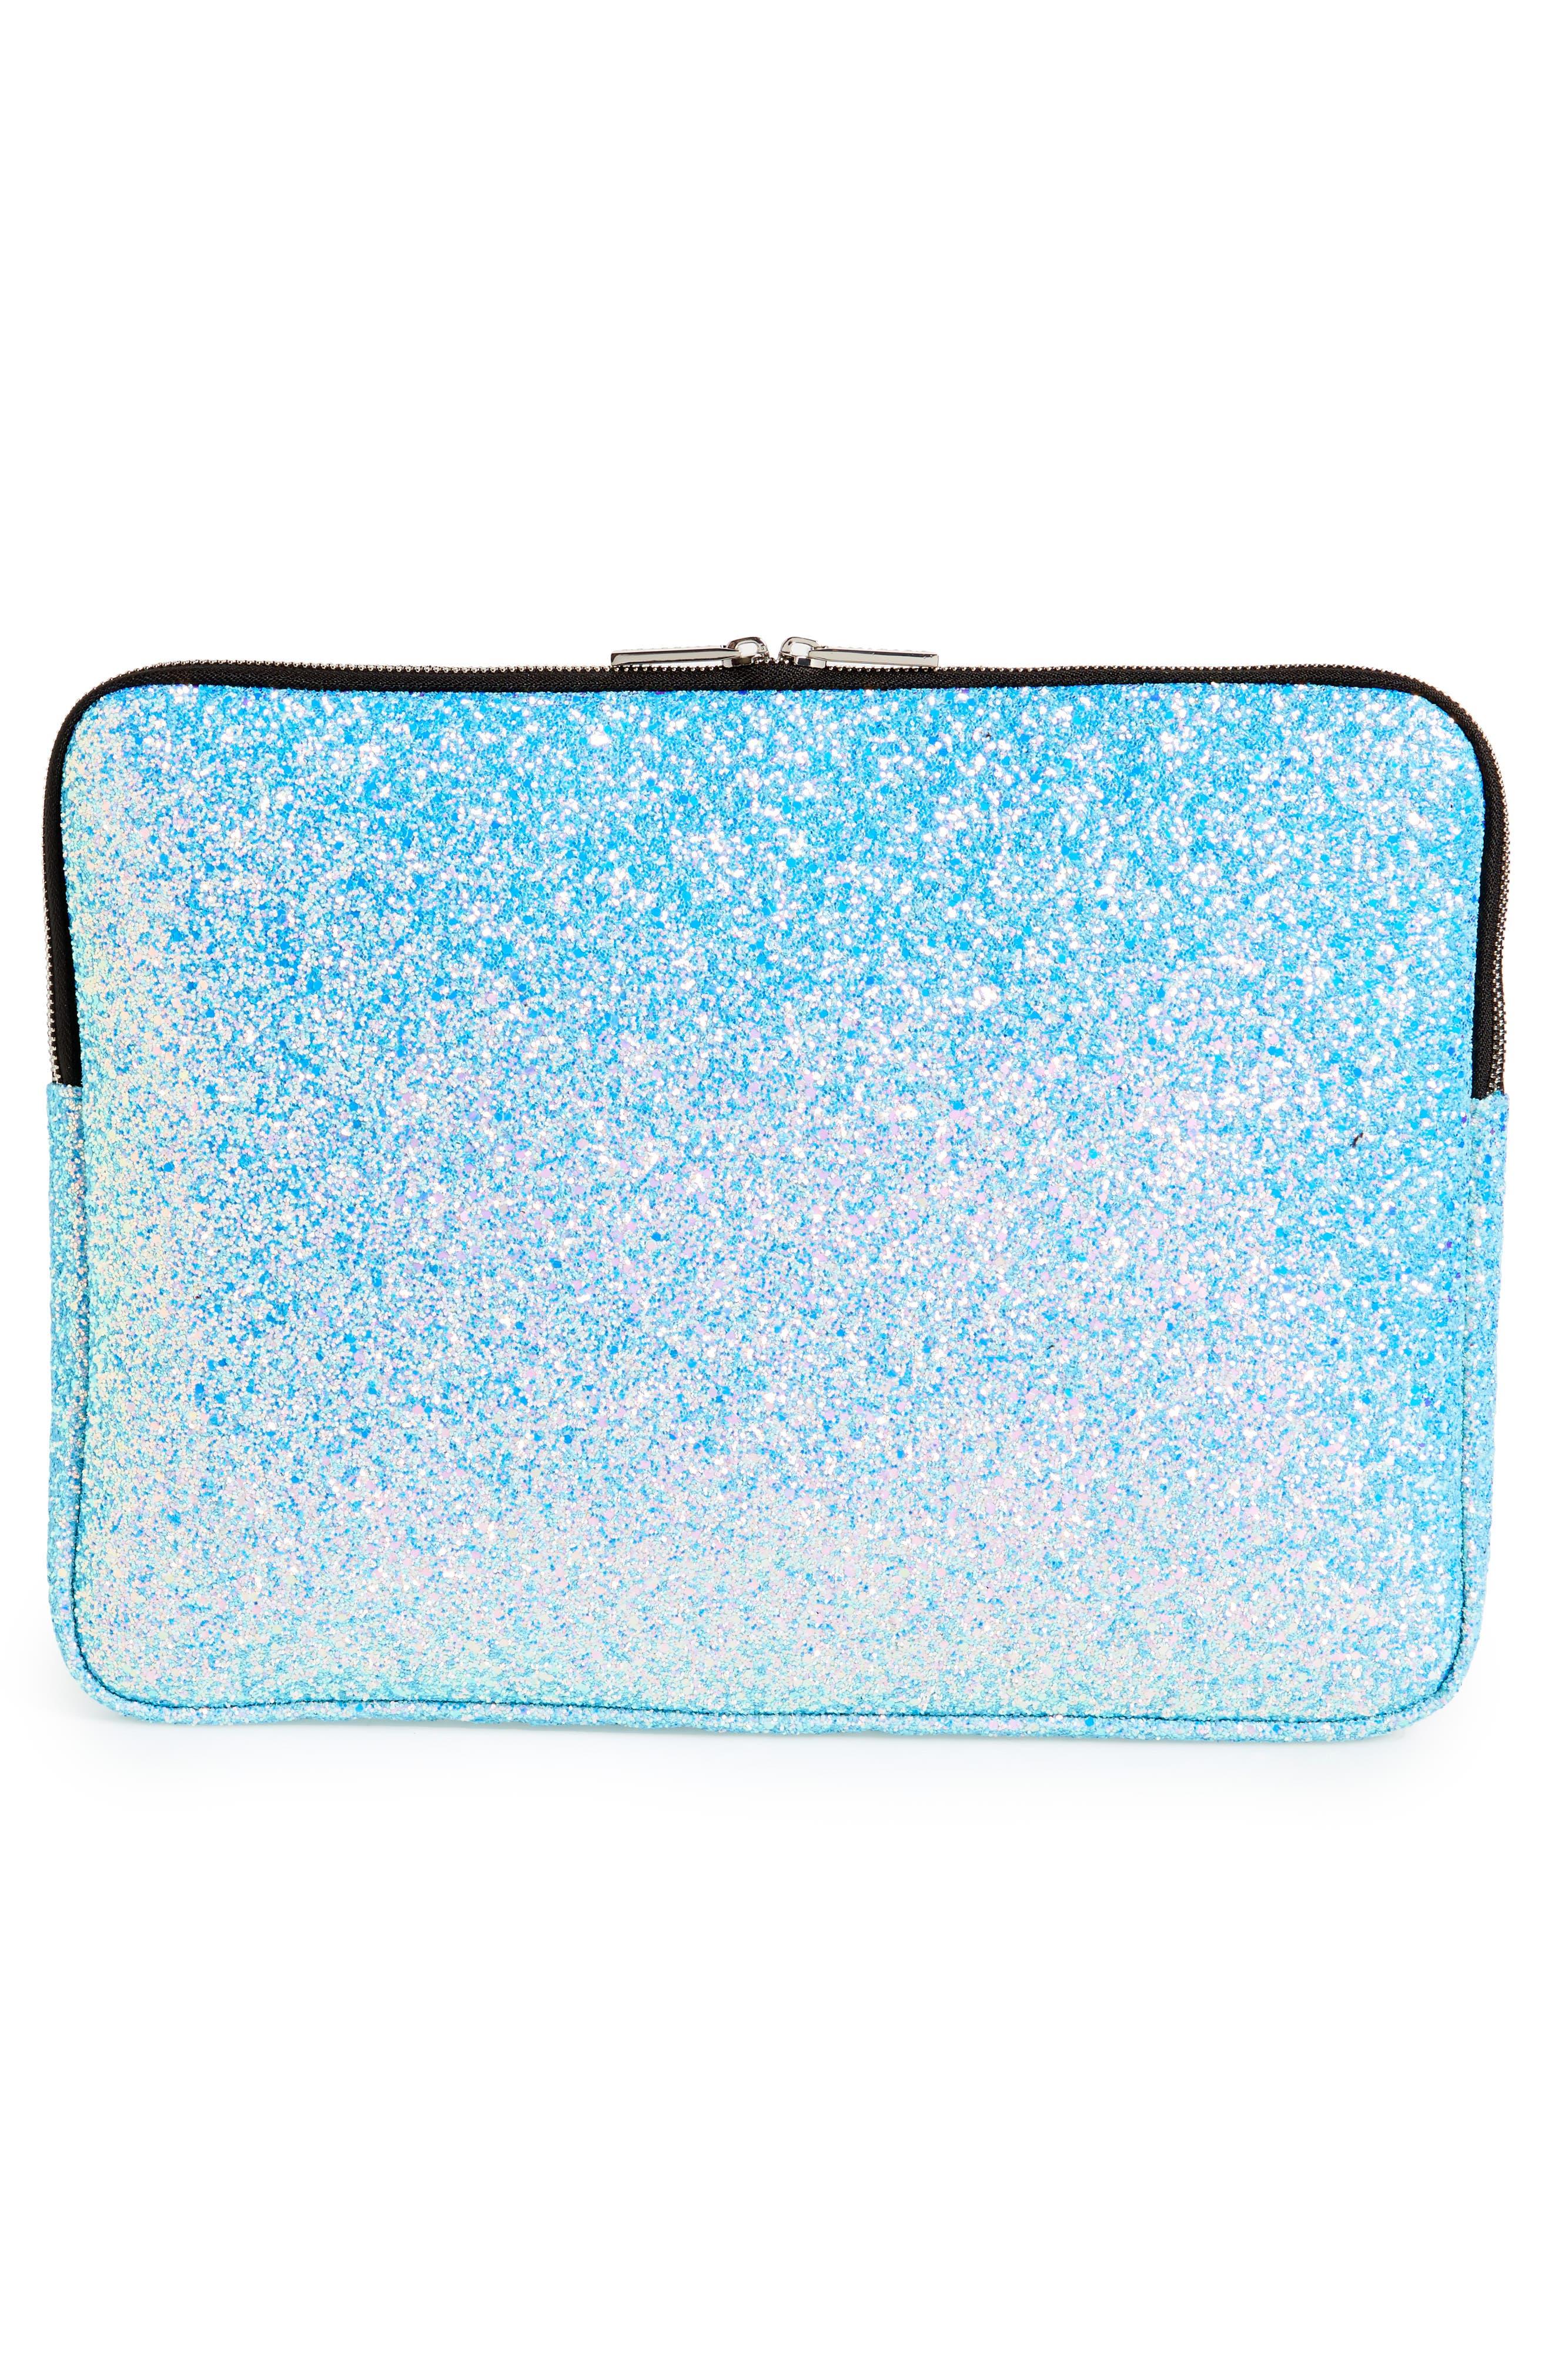 Skinnydip Glitter 15-Inch Laptop Sleeve